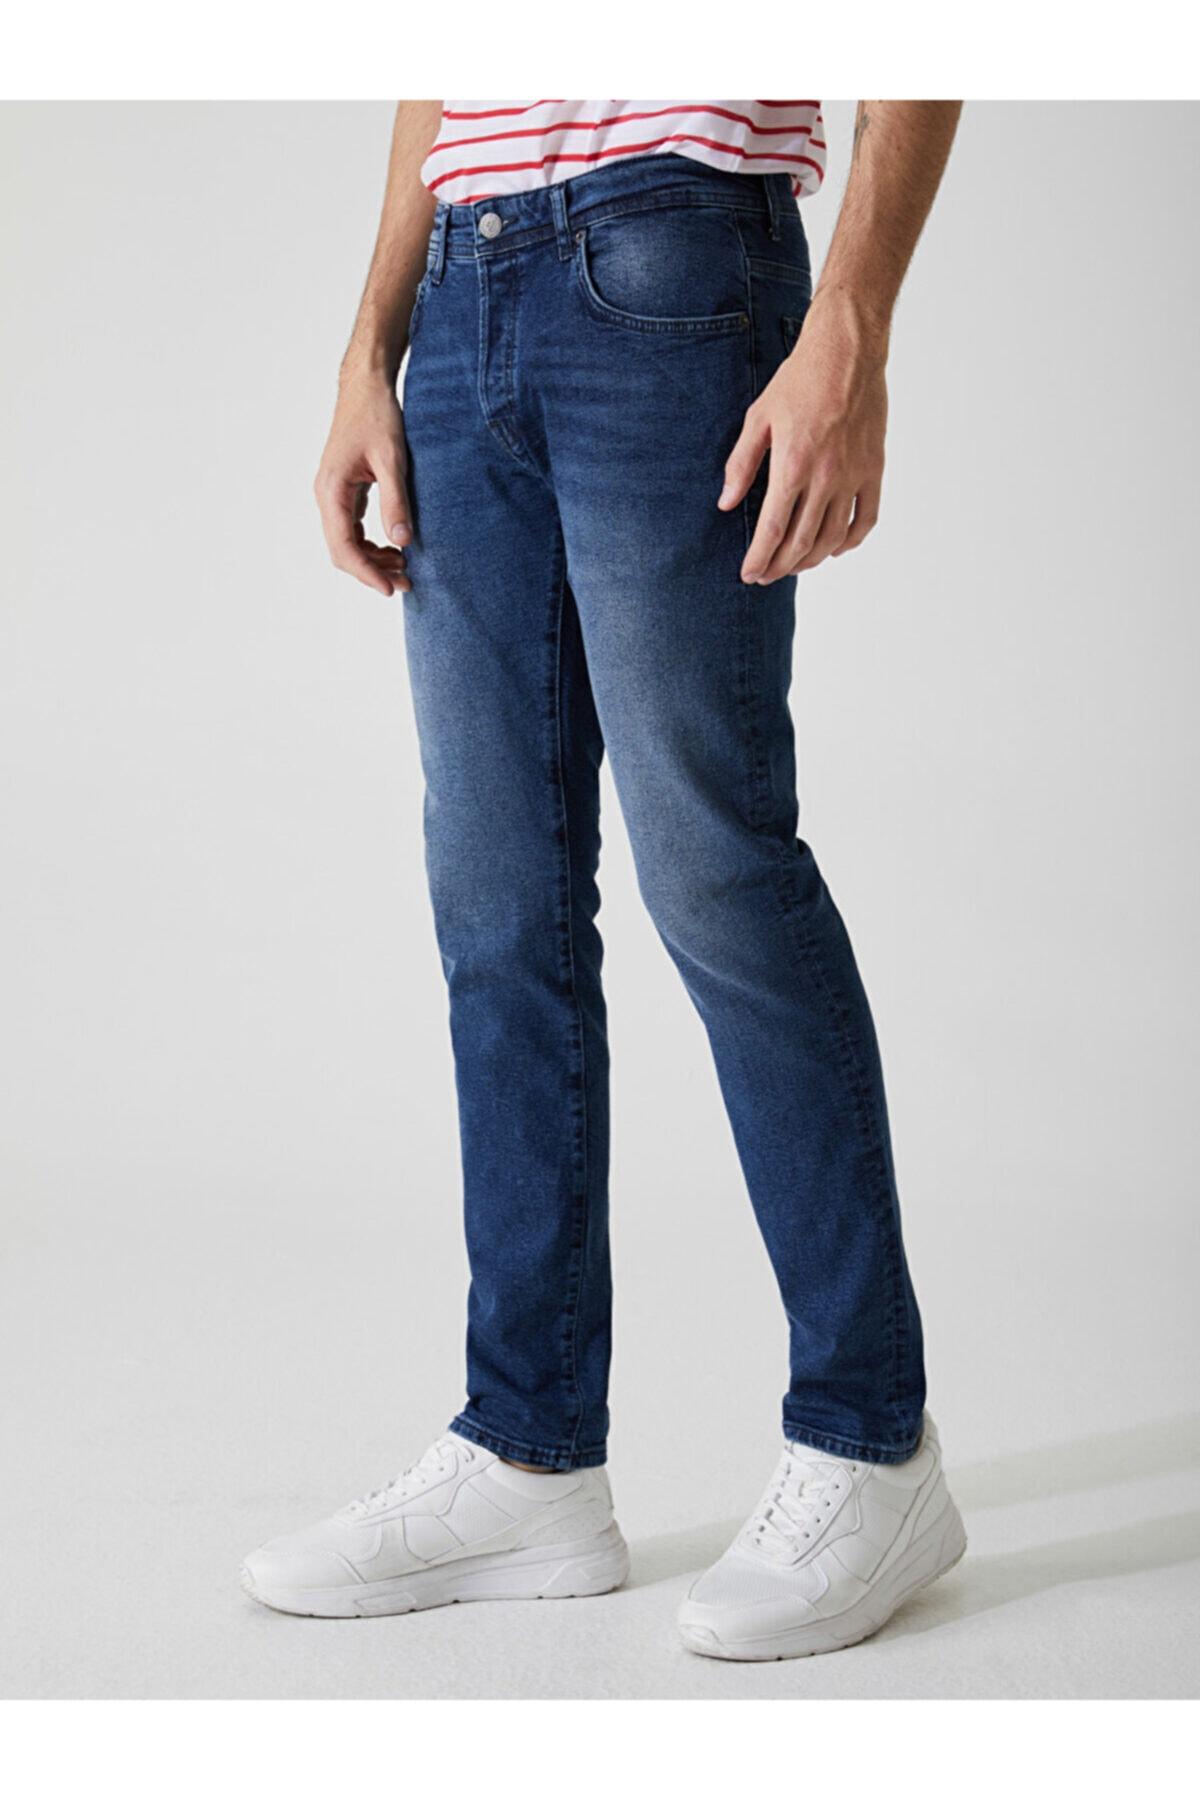 Hammond Dexter Wash Pantolon